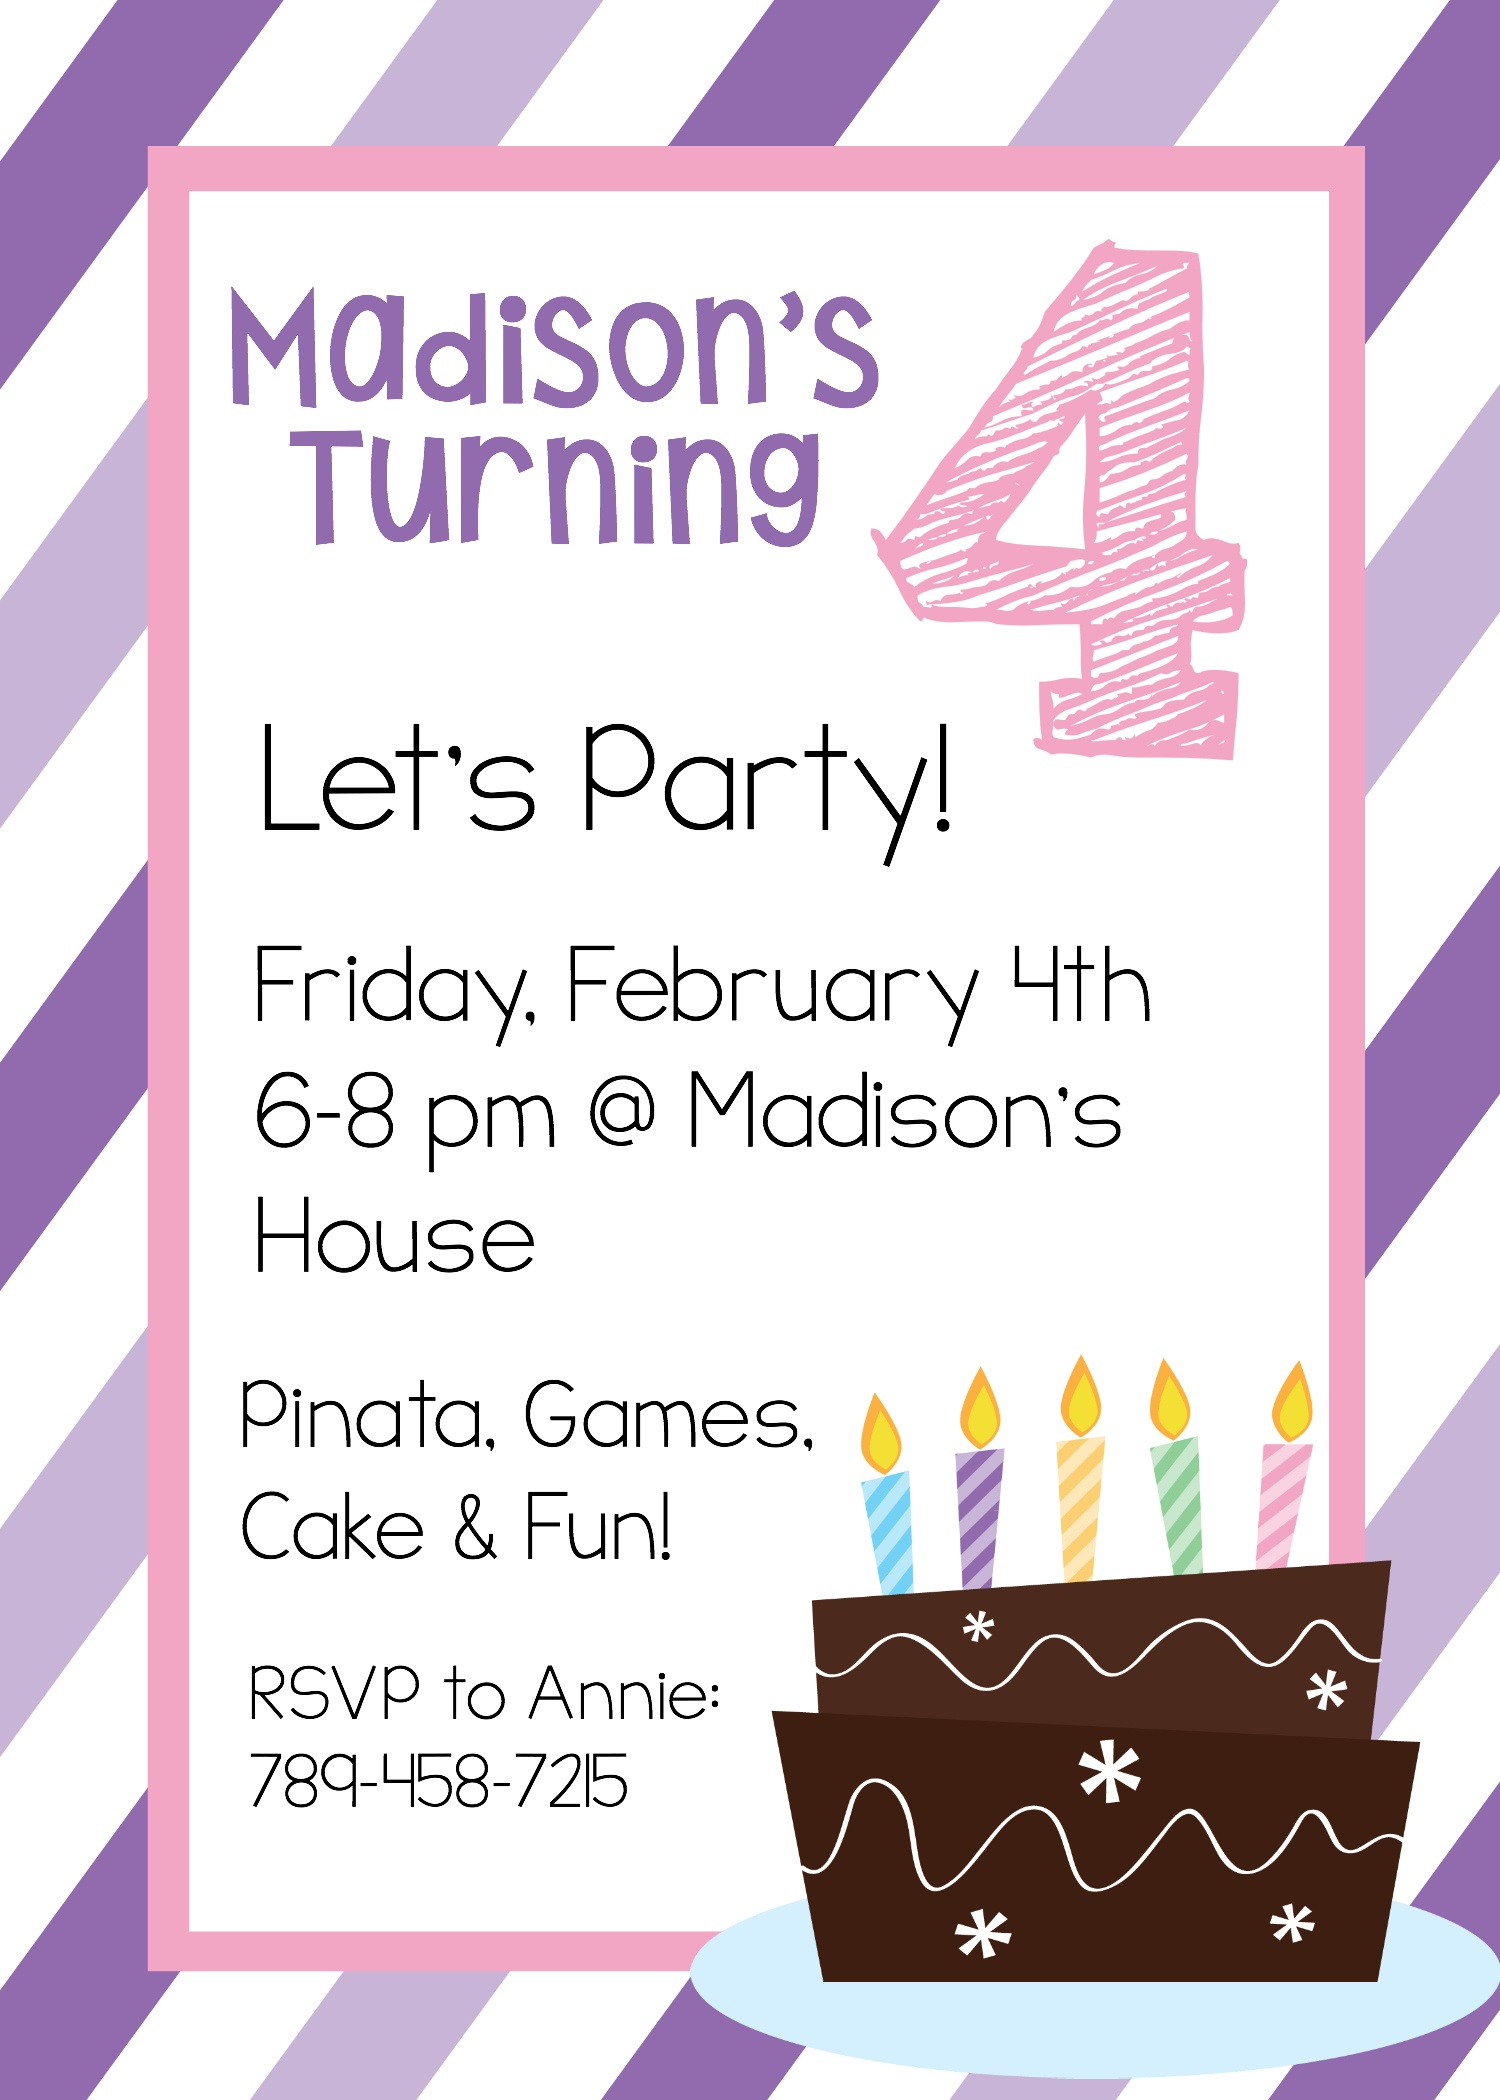 Birthday Invitations Online Free Printables - Tutlin.psstech.co - Birthday Party Invitations Online Free Printable